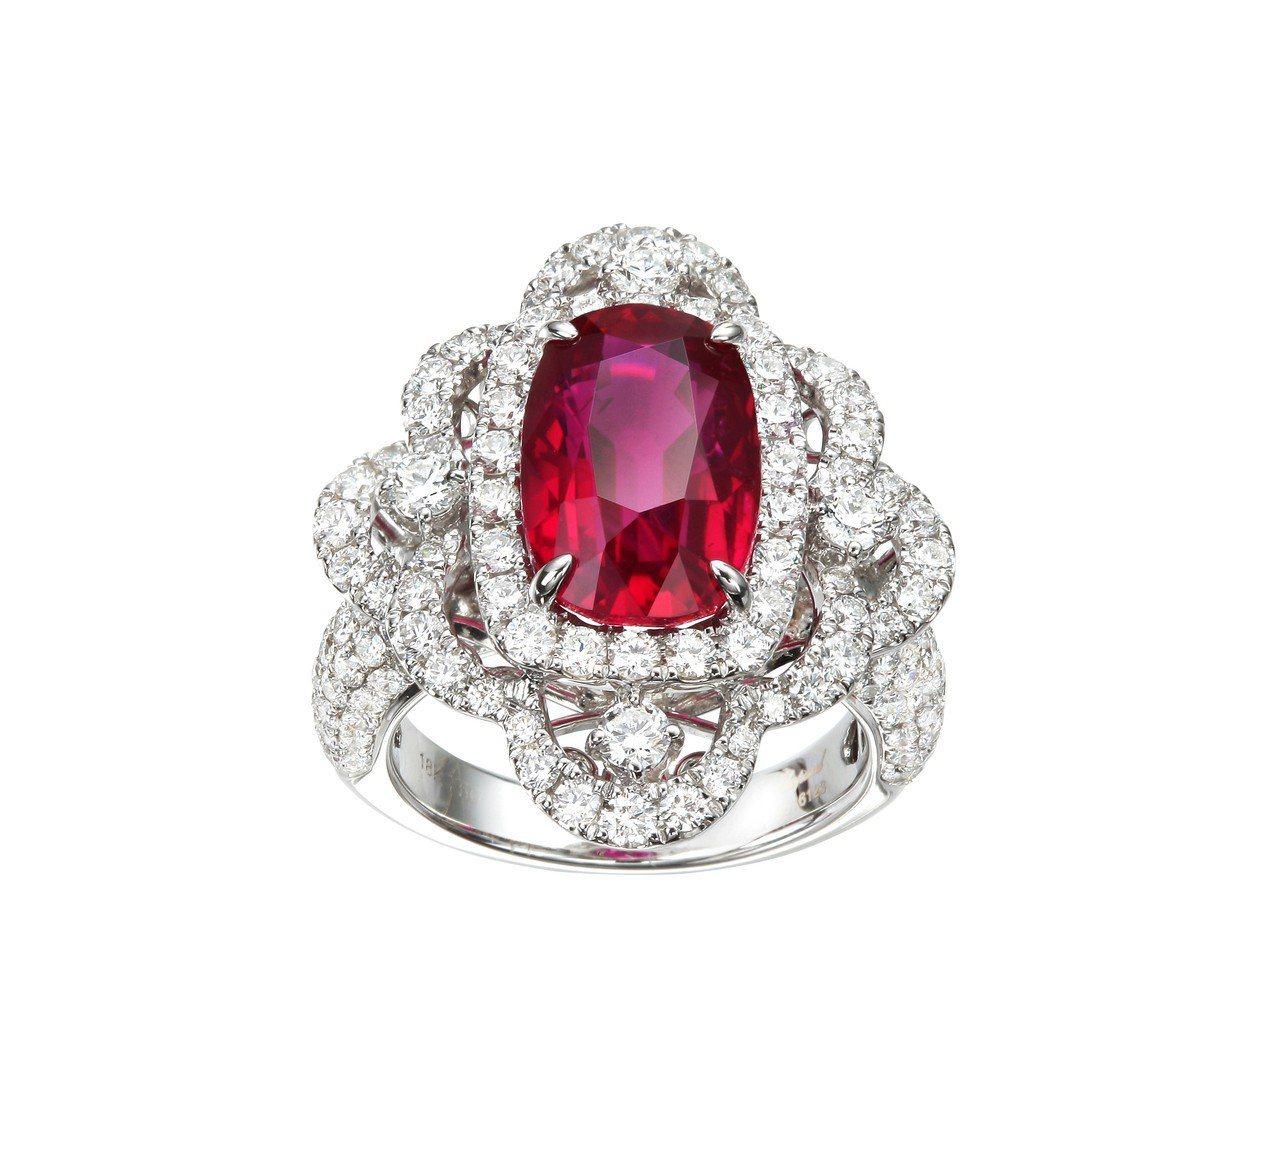 Red Carpet系列紅寶石套組珠寶,戒指鑲嵌紅寶石7.31克拉、鑽石2.43...